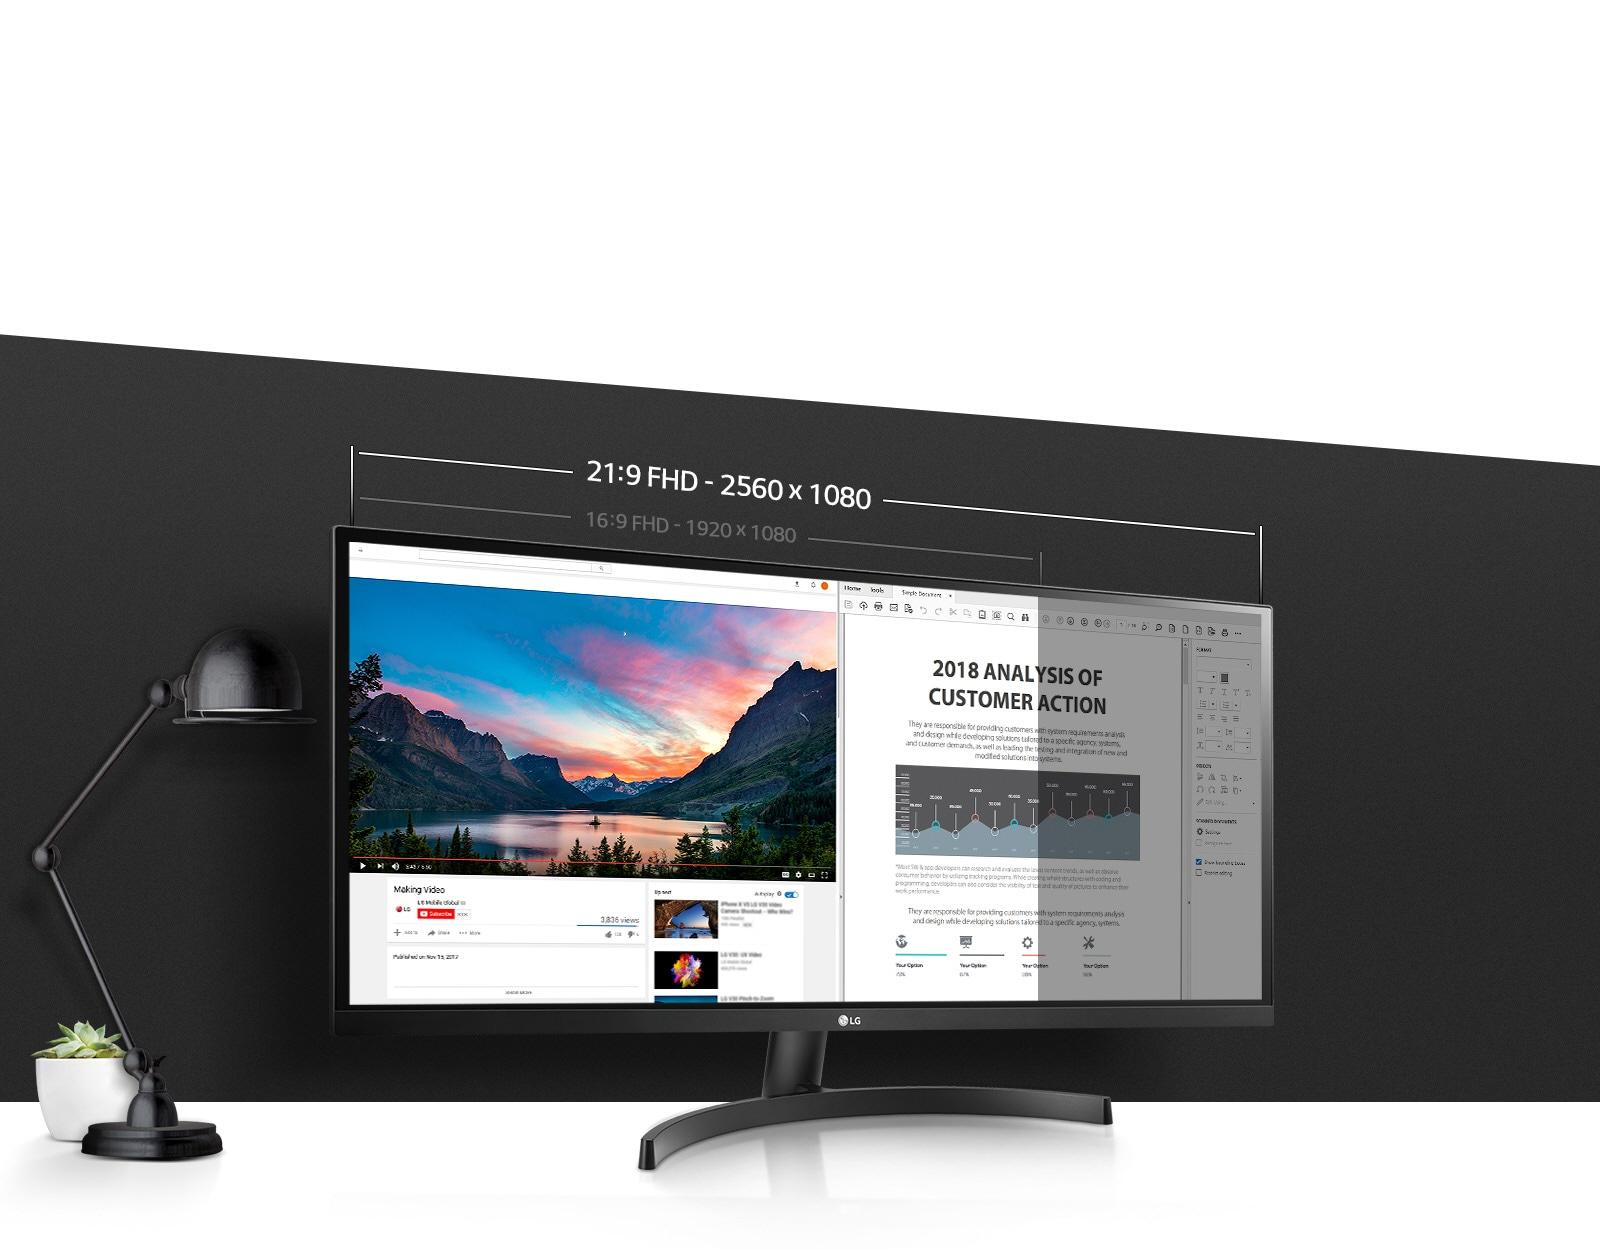 LG 34WK500 | 34 Inch 21:9 UltraWide Monitor | LG HK